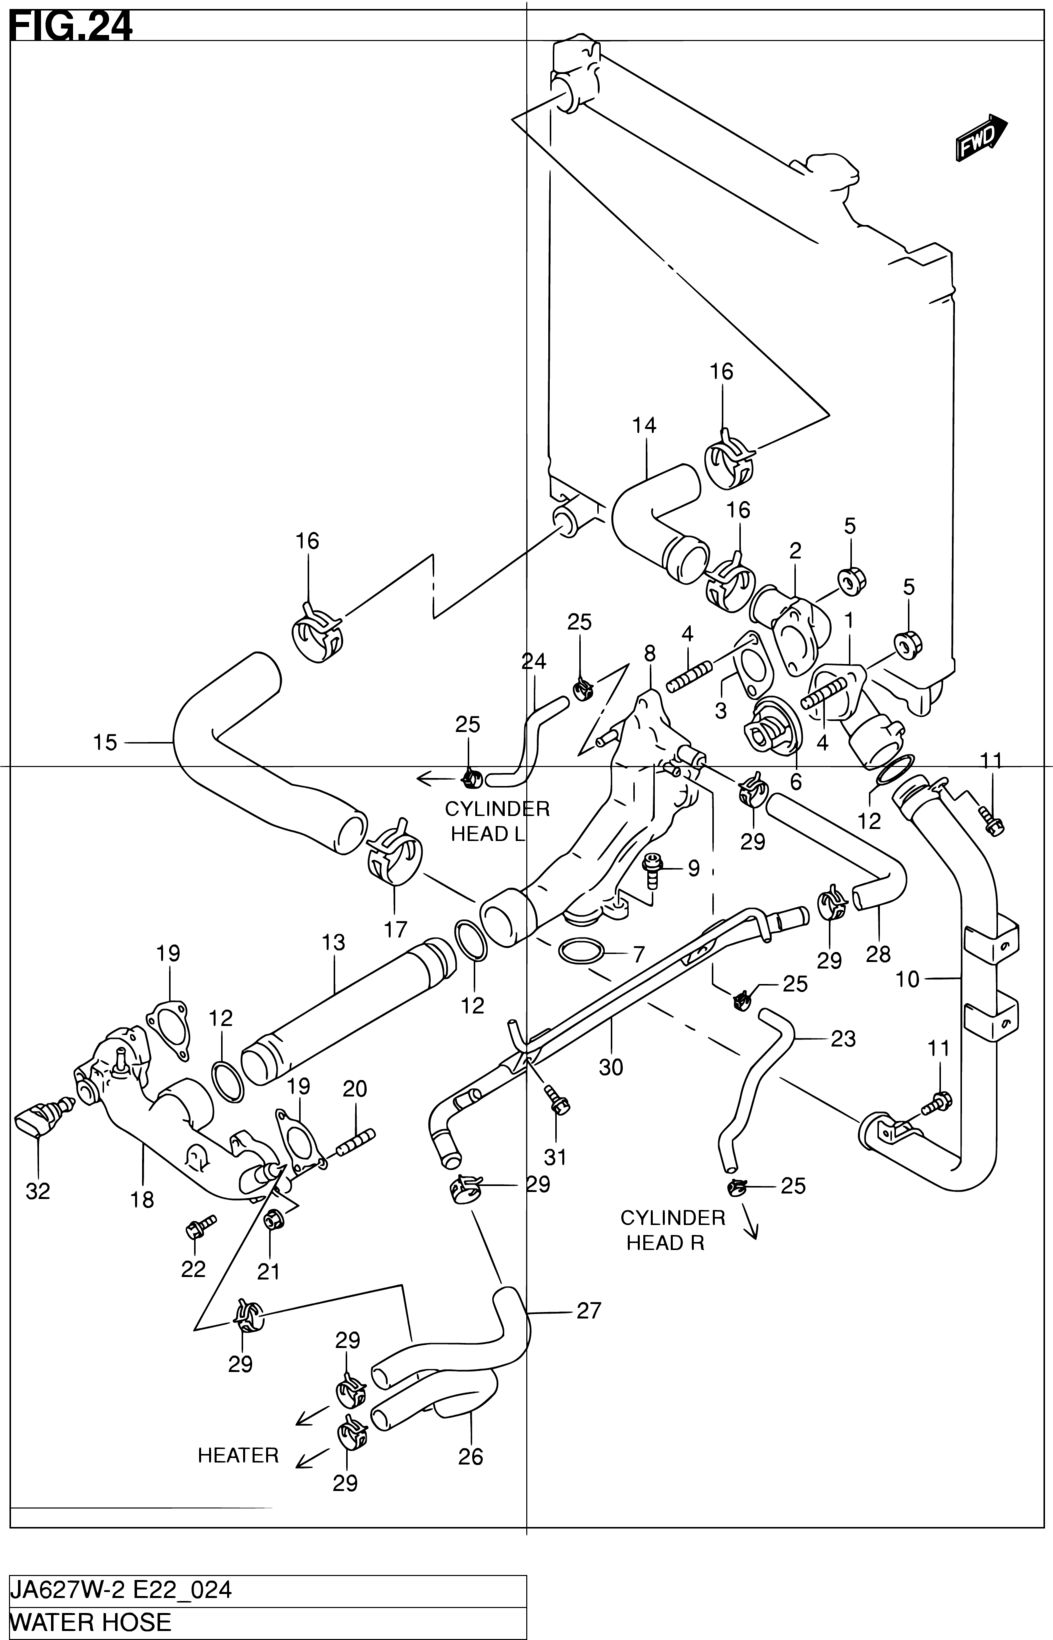 Engine Coolant Pipe O-Ring Mahle C32387